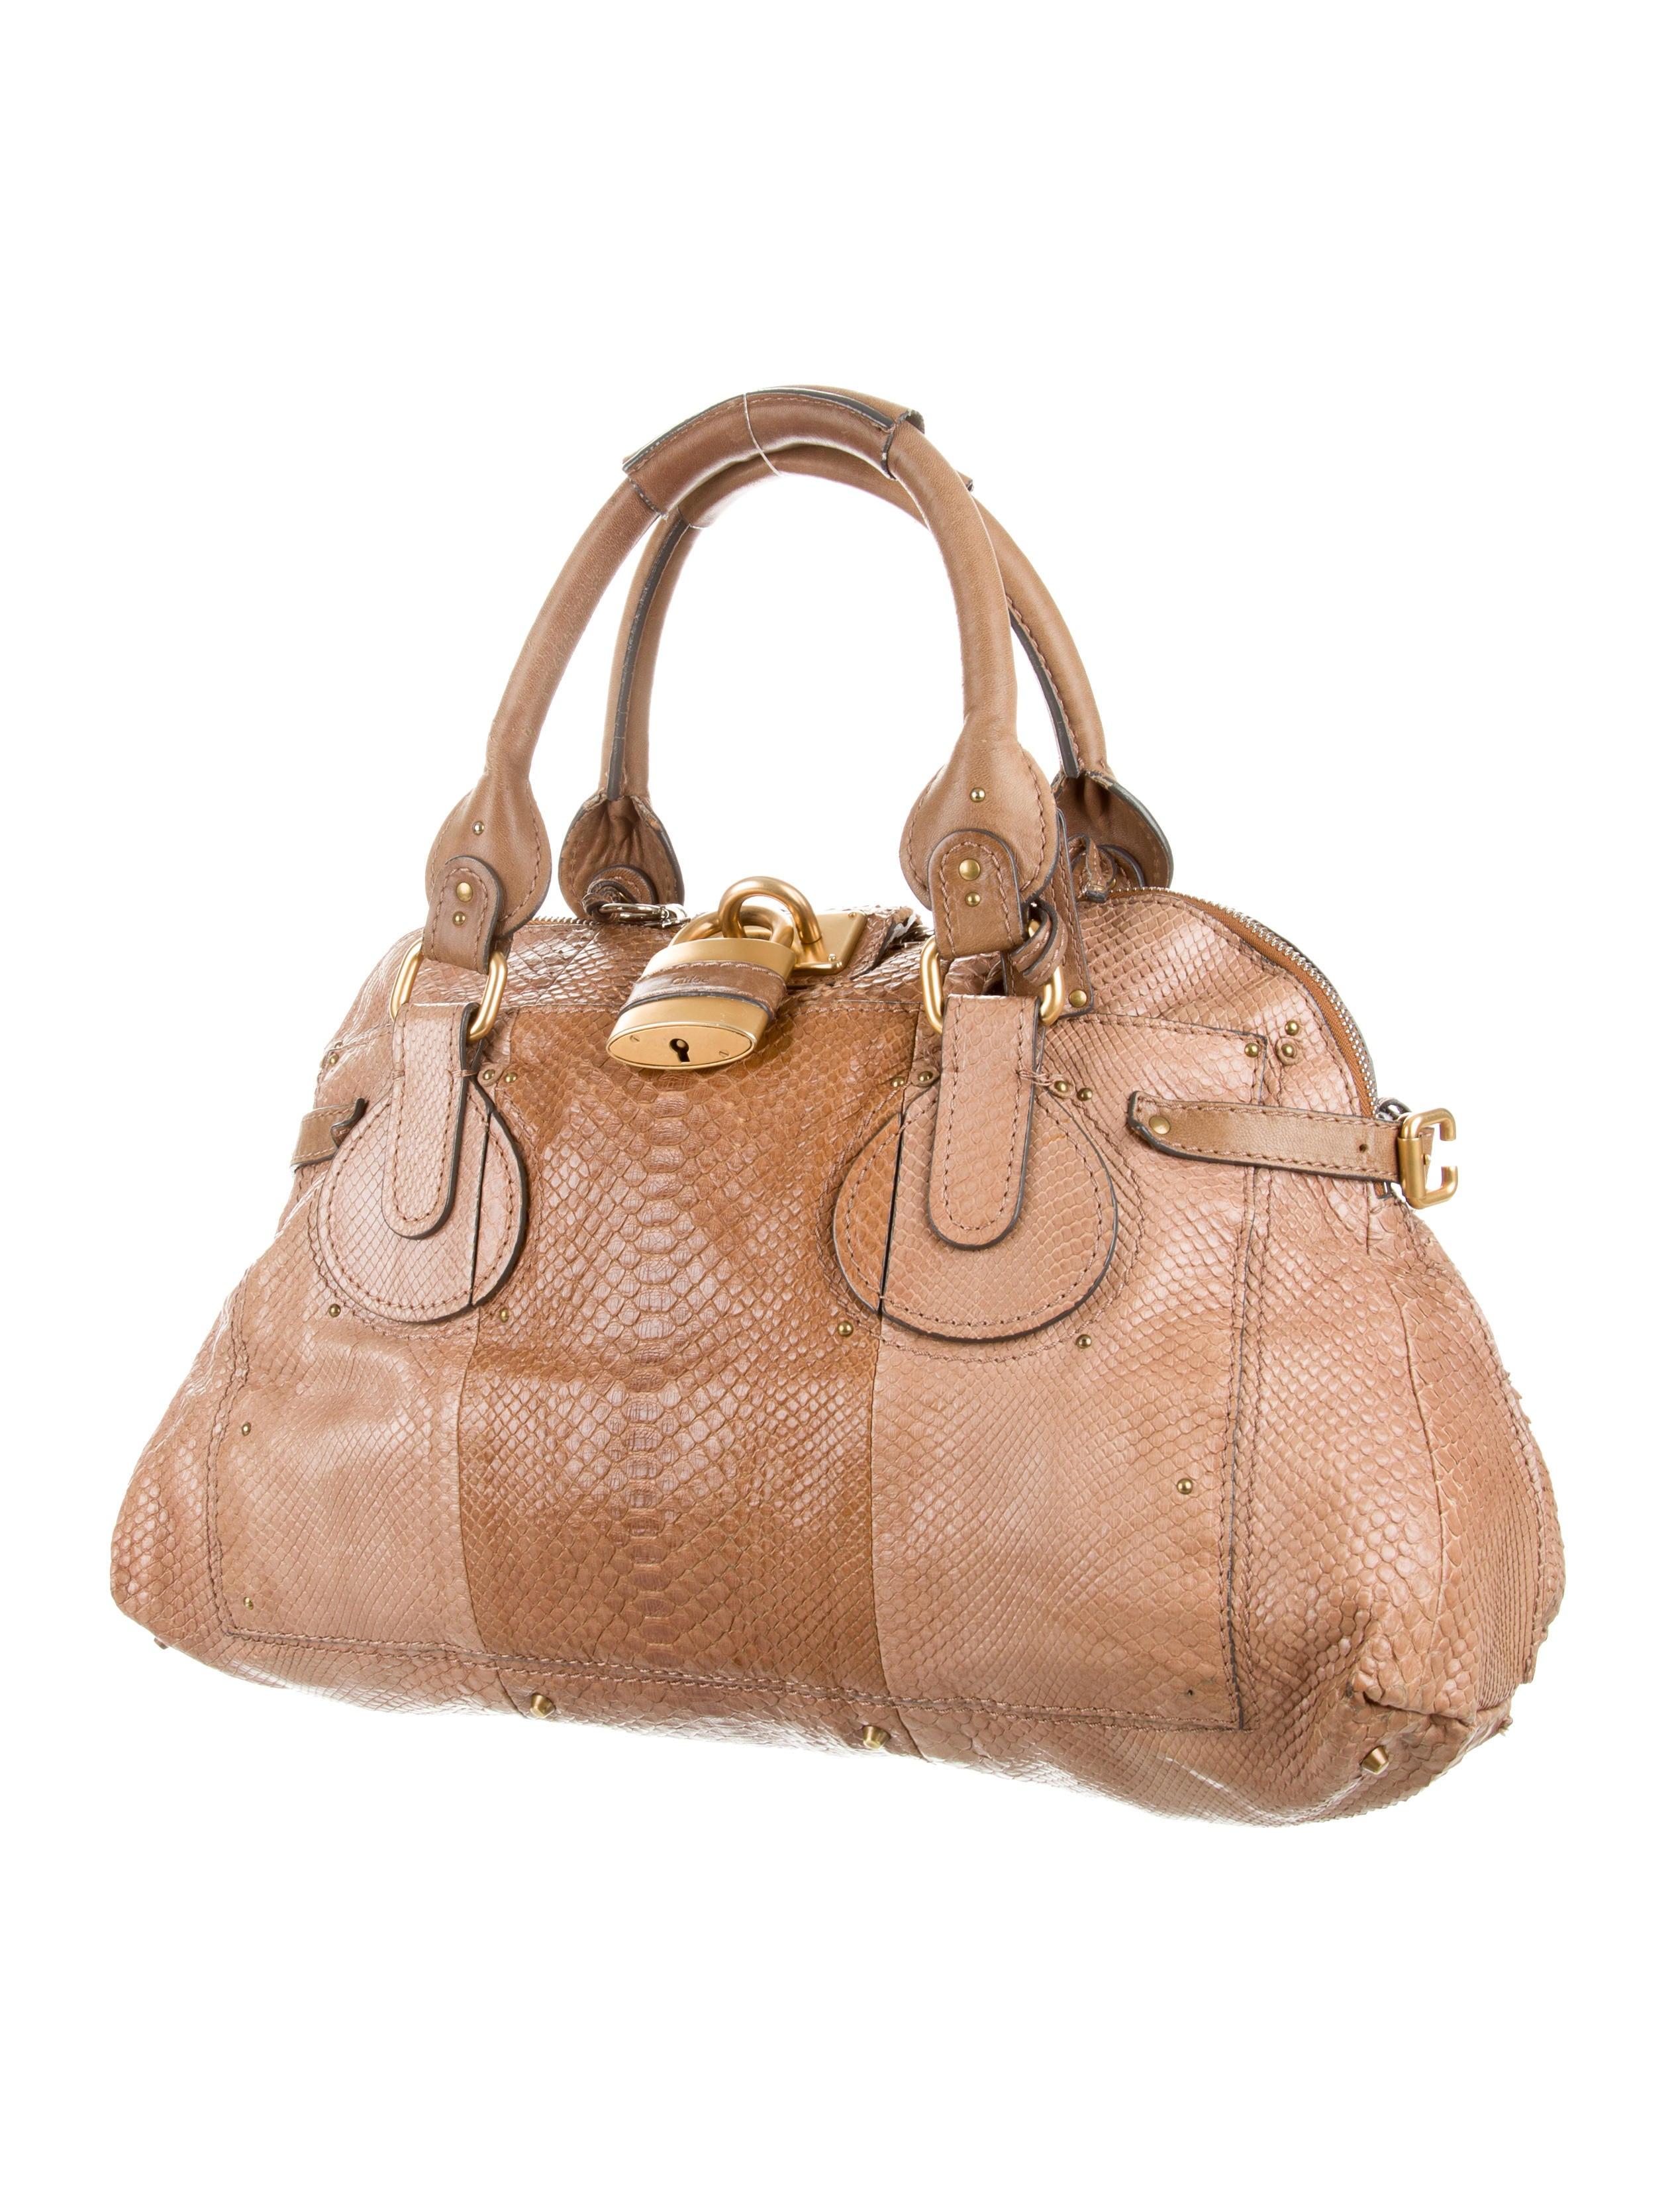 chloe marcie bag knockoff - chloe python paddington bag, chloe handbags replica uk